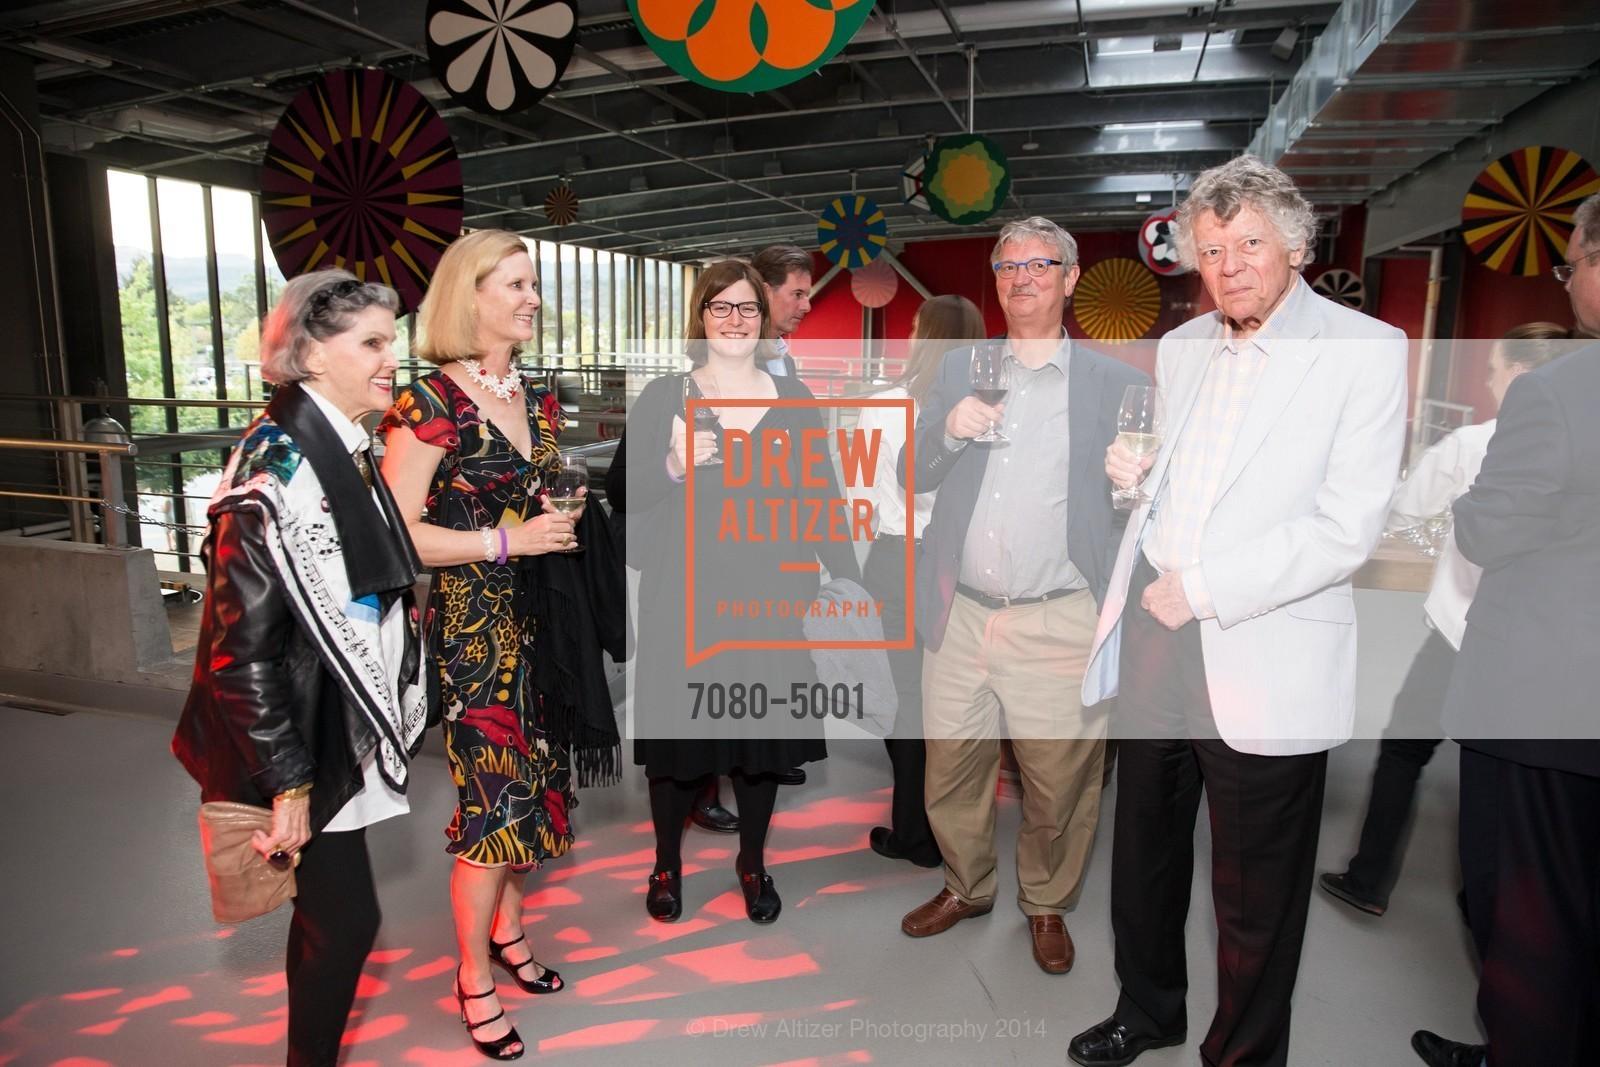 Donna Long, Wendy Fritz, Christina Gembaczka, Job Maarse, Gordon Getty, Photo #7080-5001